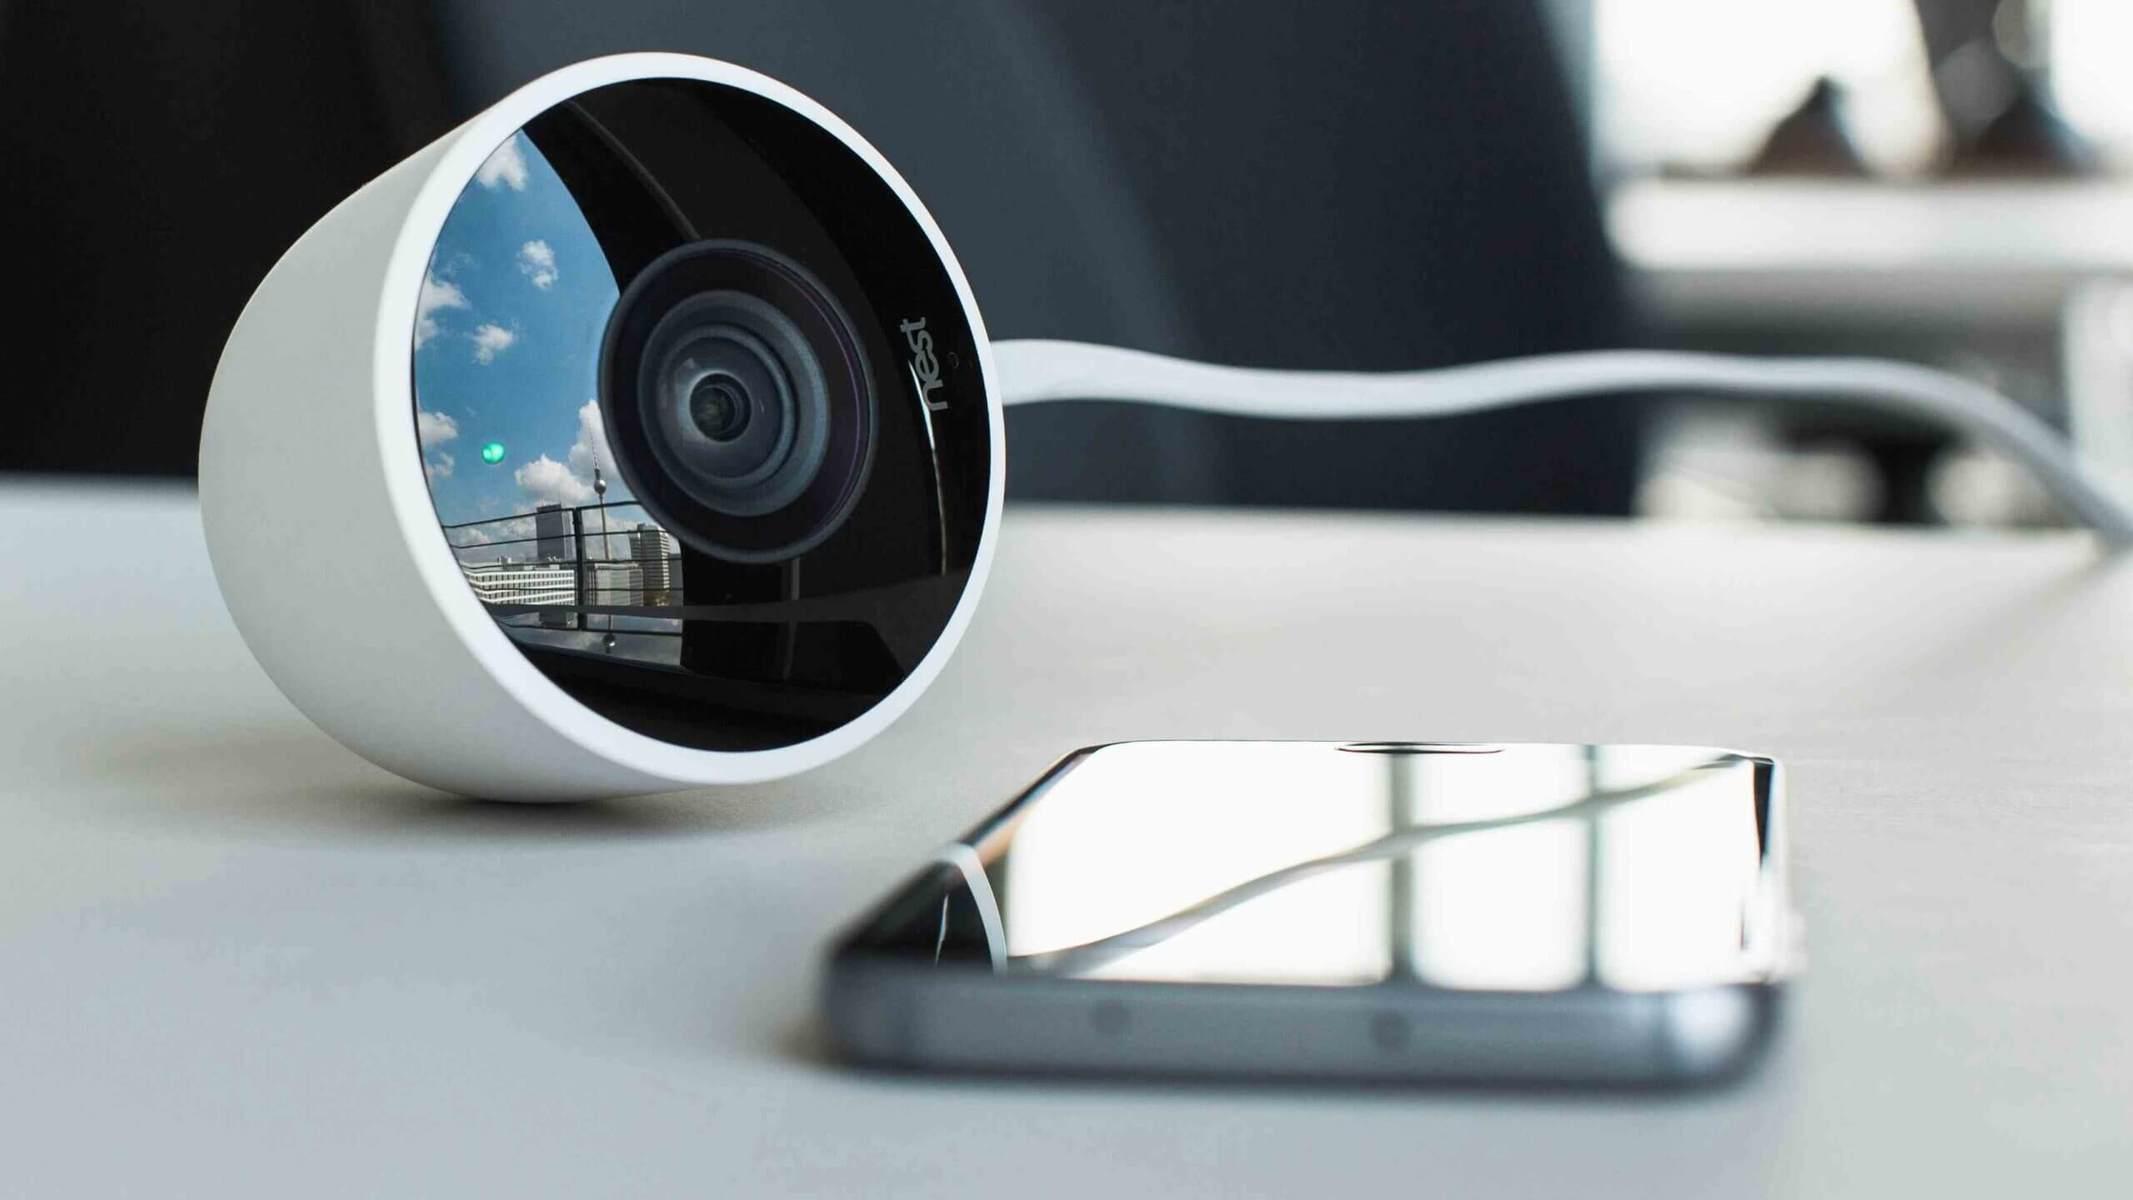 camara de vigilancia exterior